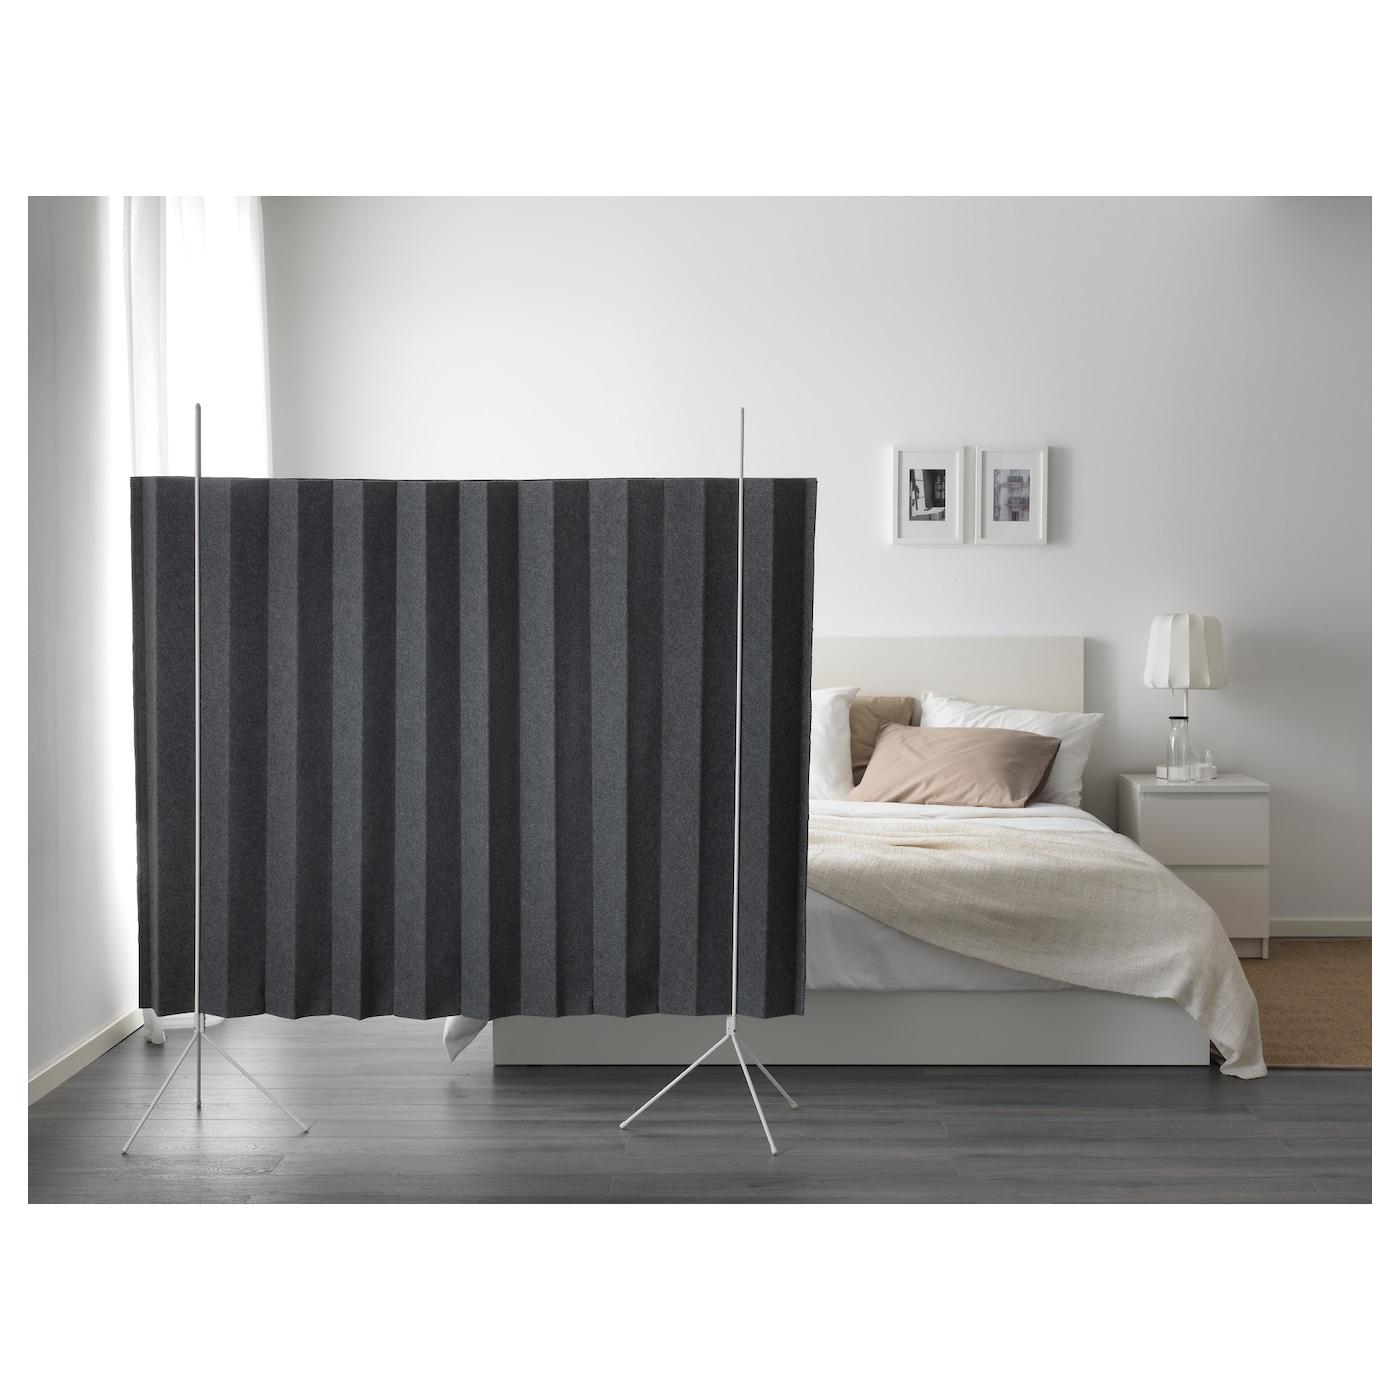 ikea ps 2017 paravent 150x158 cm ikea. Black Bedroom Furniture Sets. Home Design Ideas